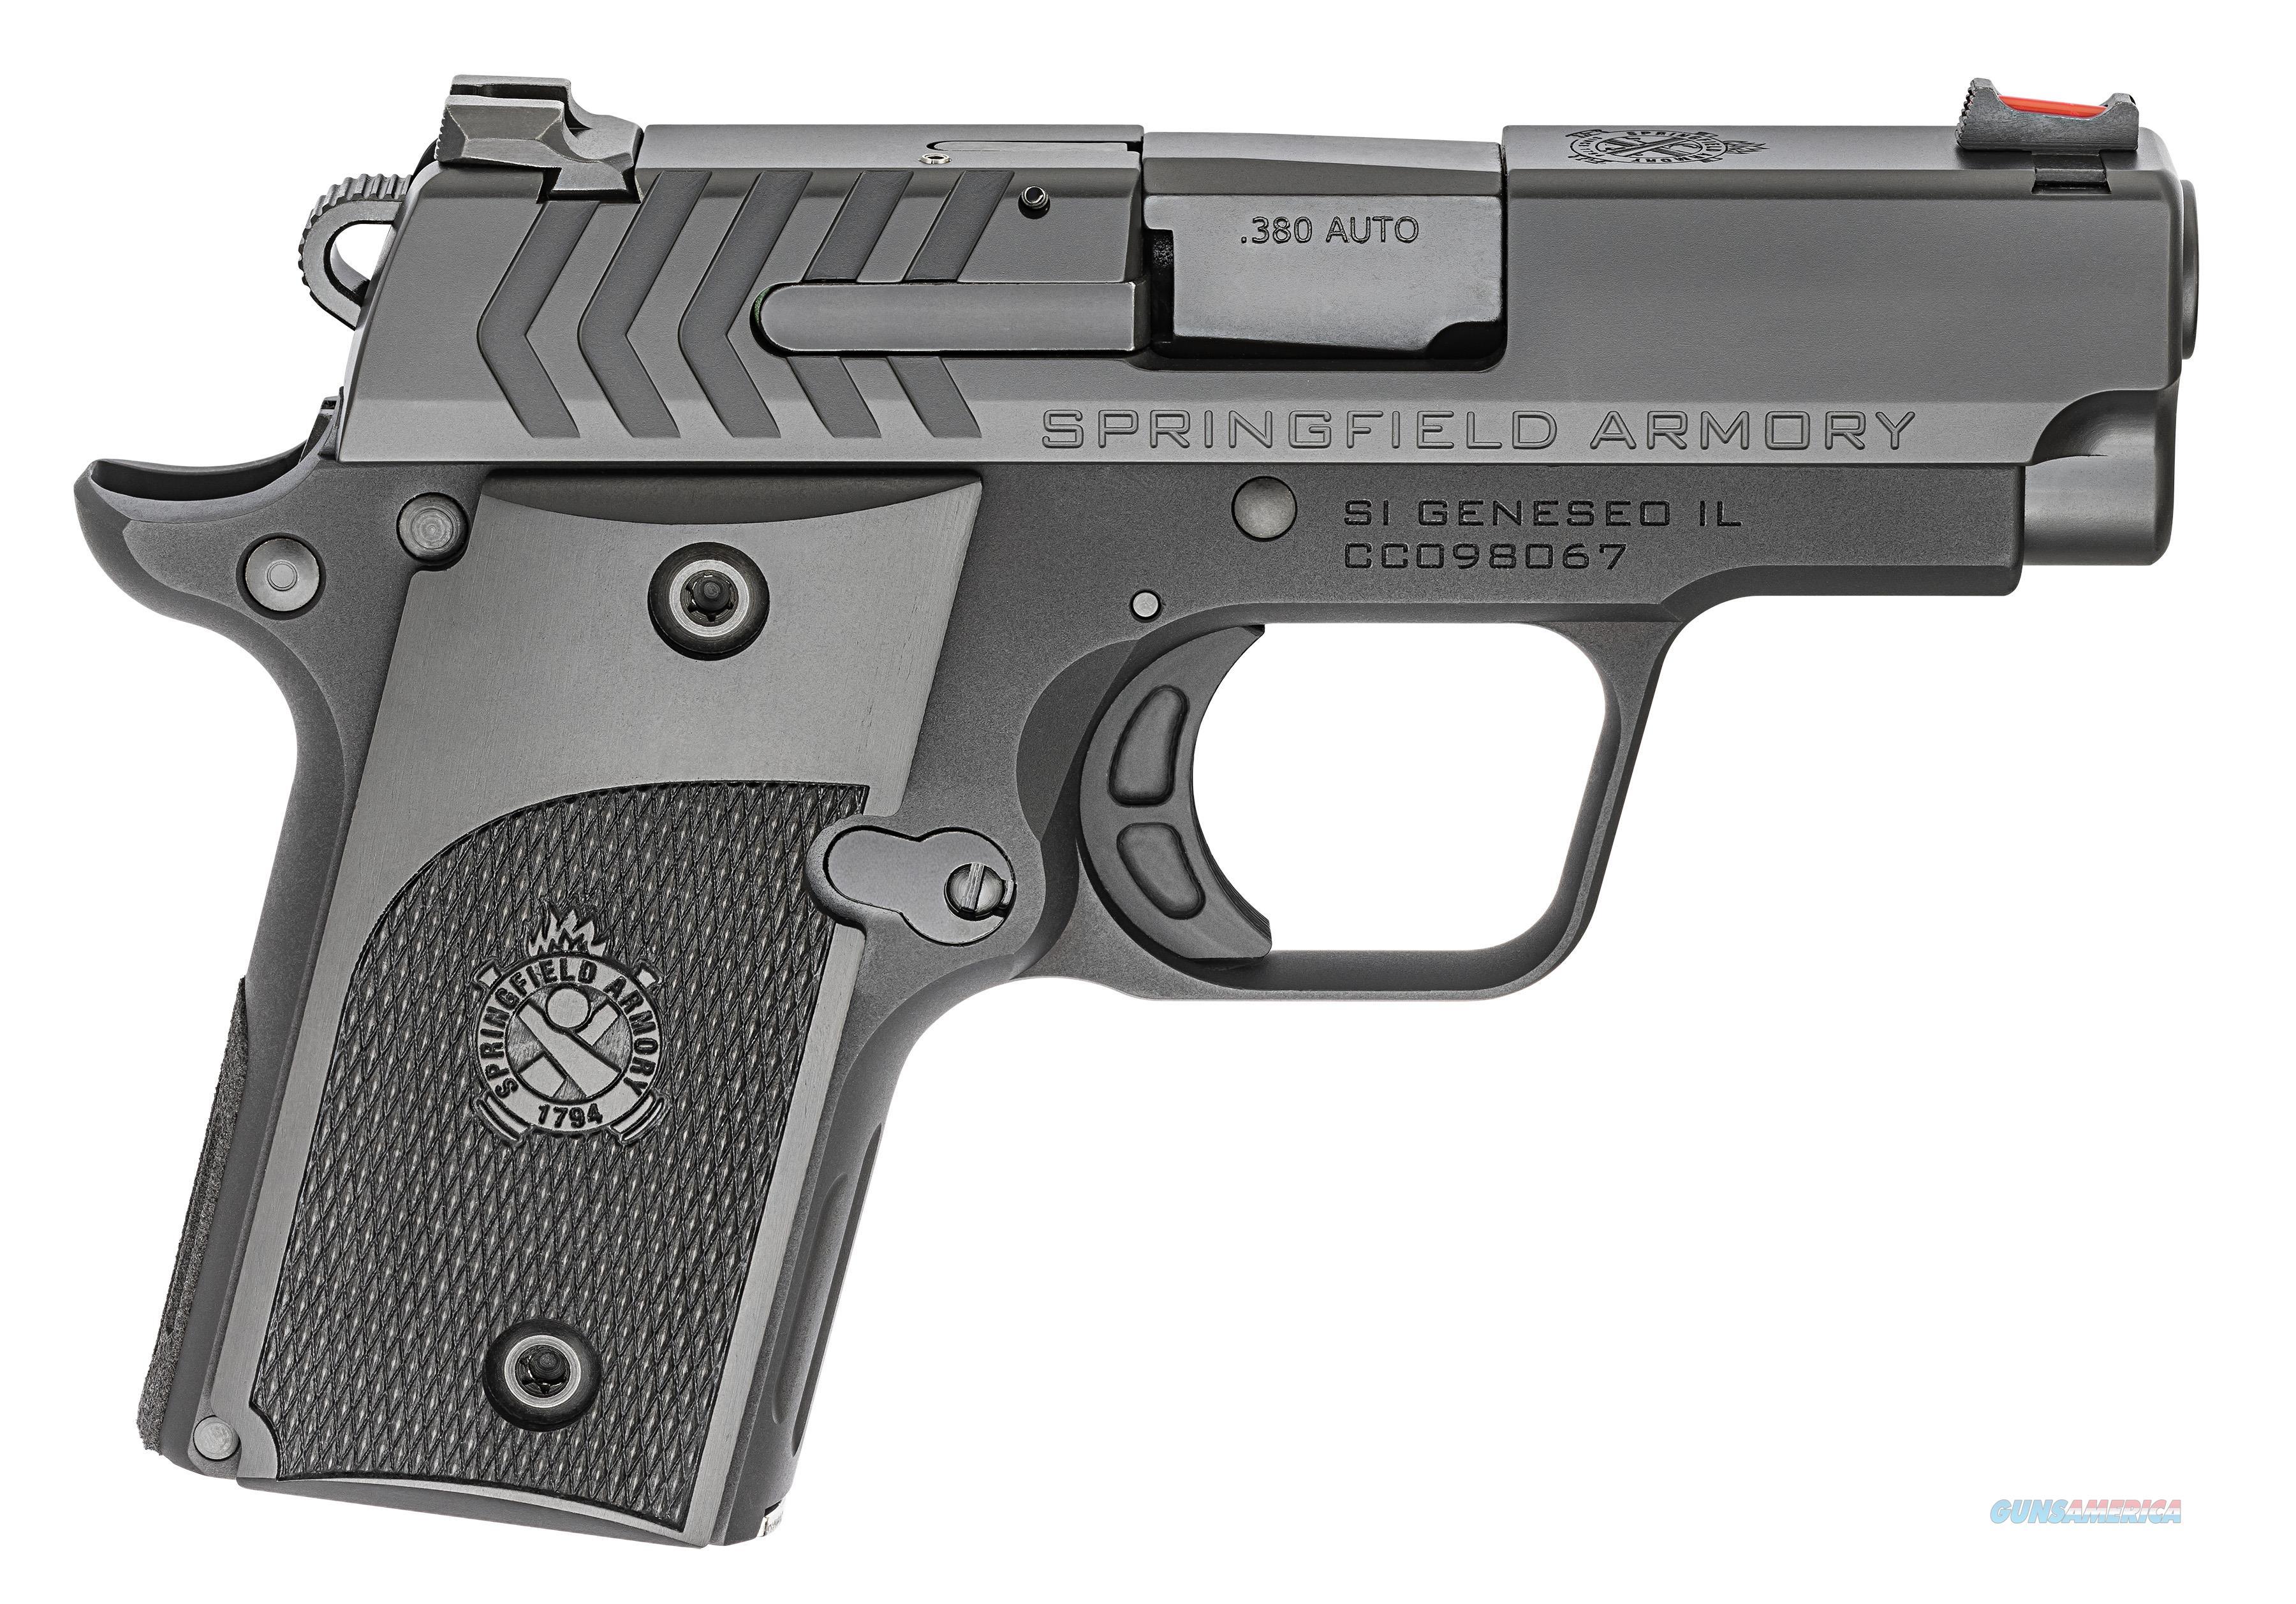 Springfield Armory 911 Alpha, .380 , NIB  Guns > Pistols > Springfield Armory Pistols > 911